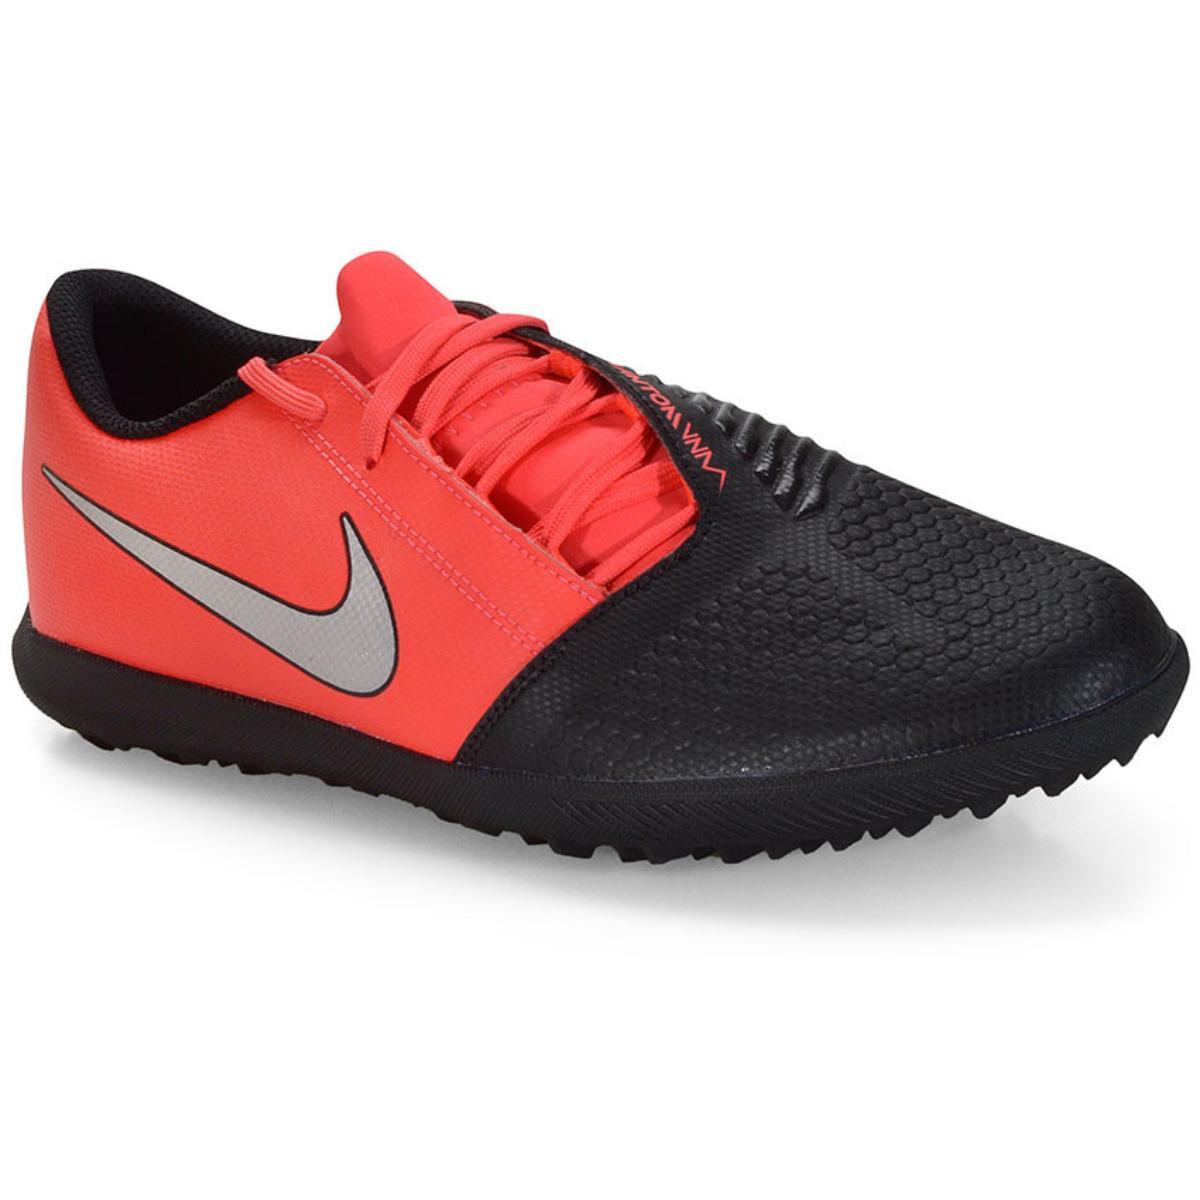 Tênis Masculino Nike Ao0579-606 Phantomvnm Club tf Preto/vermelho